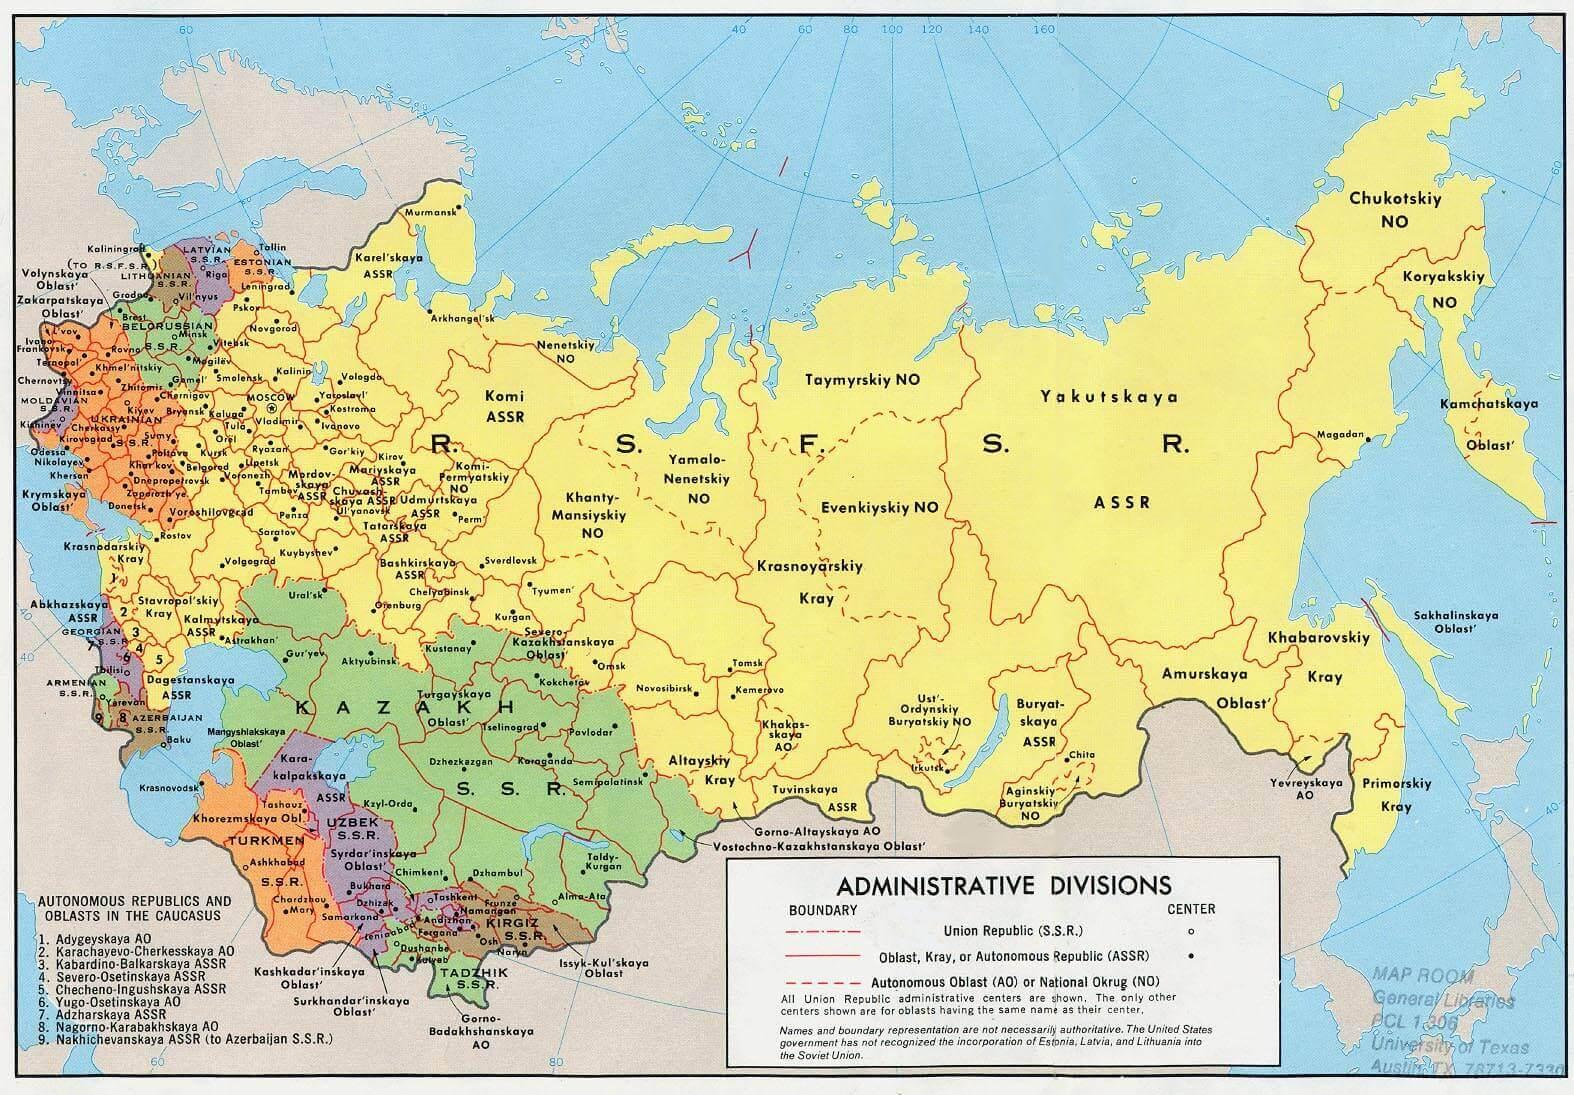 Union of Soviet Socialist Republic (Soviet Union), 1922-1991